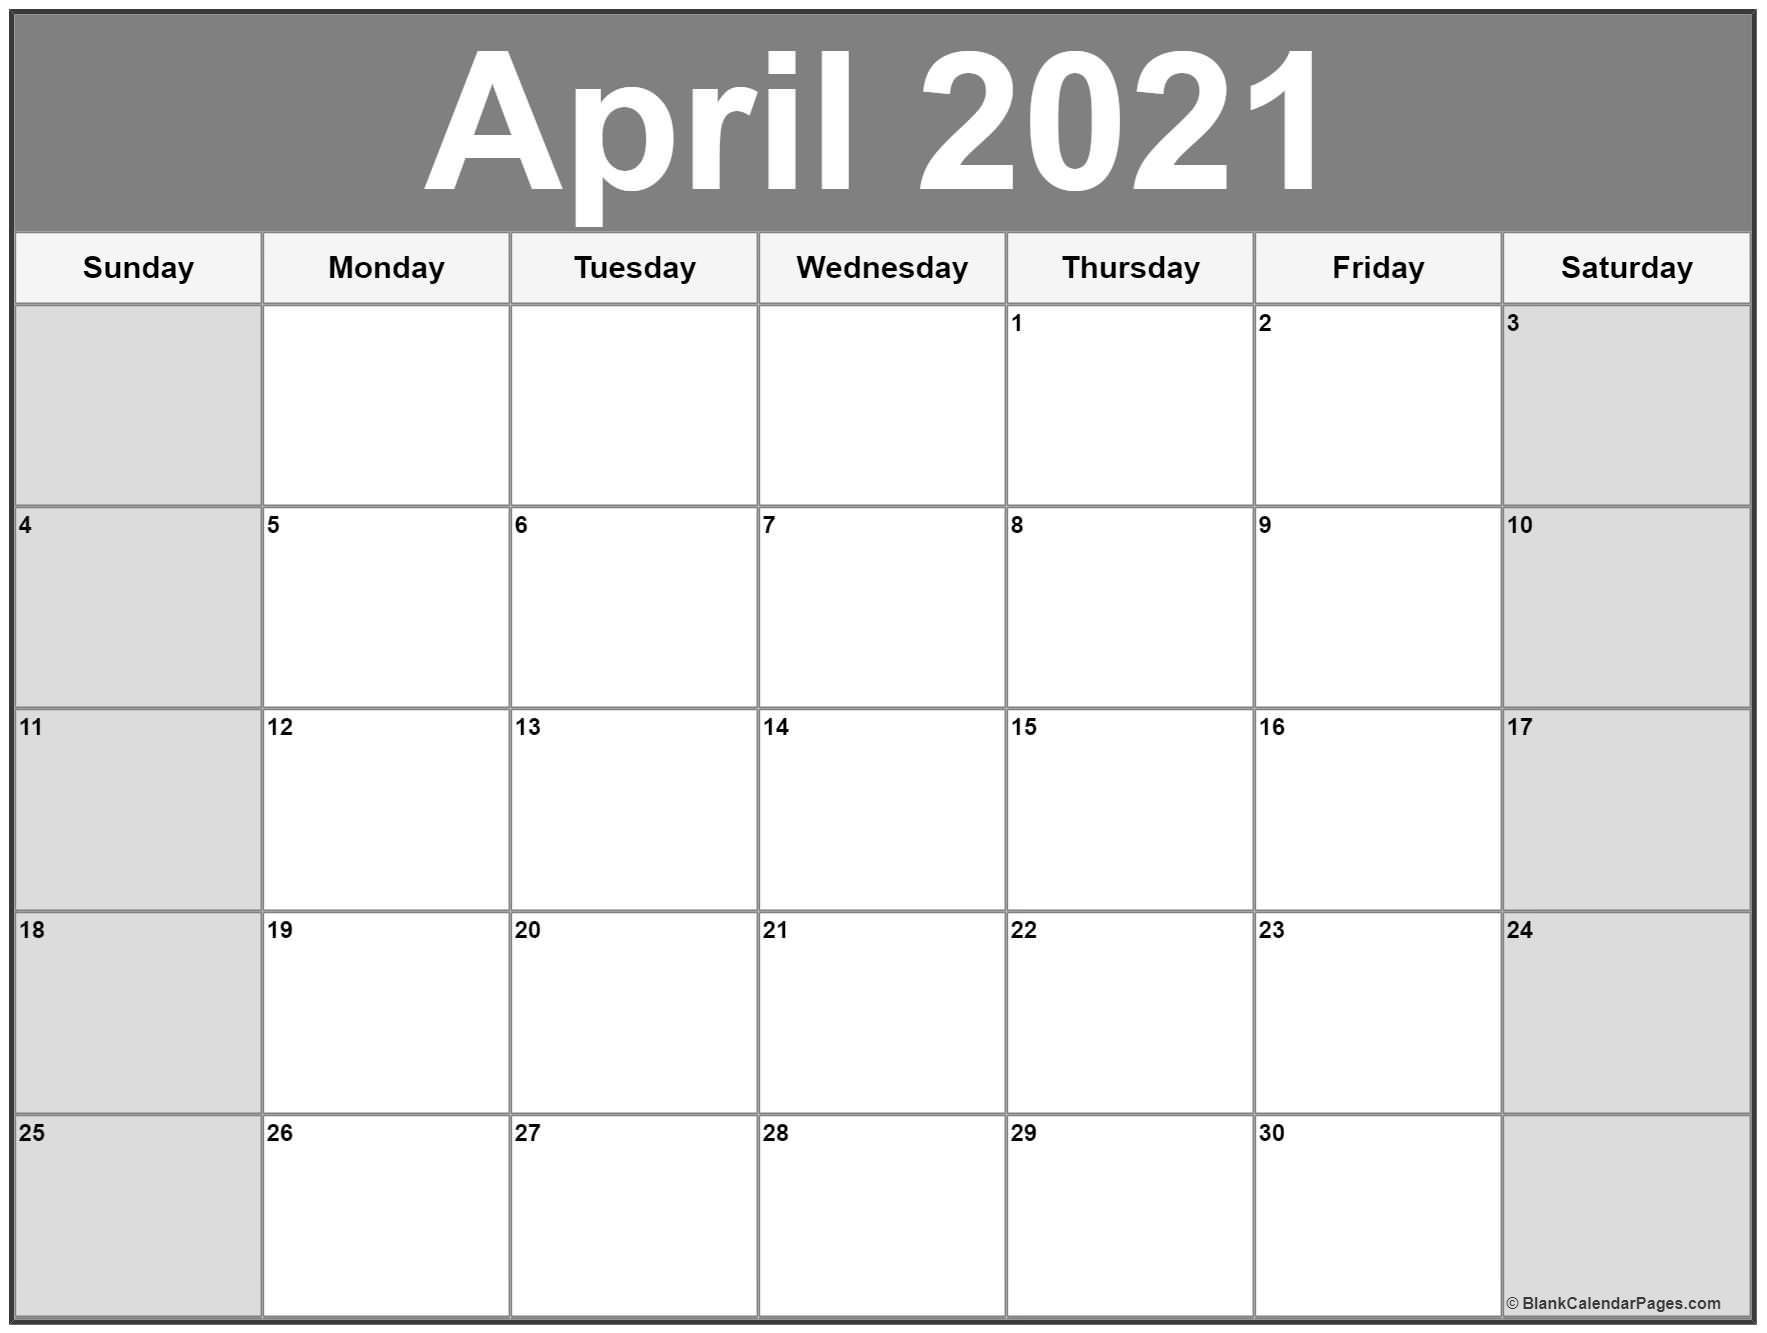 April 2021 Calendar Free Printable Monthly Calendars 4